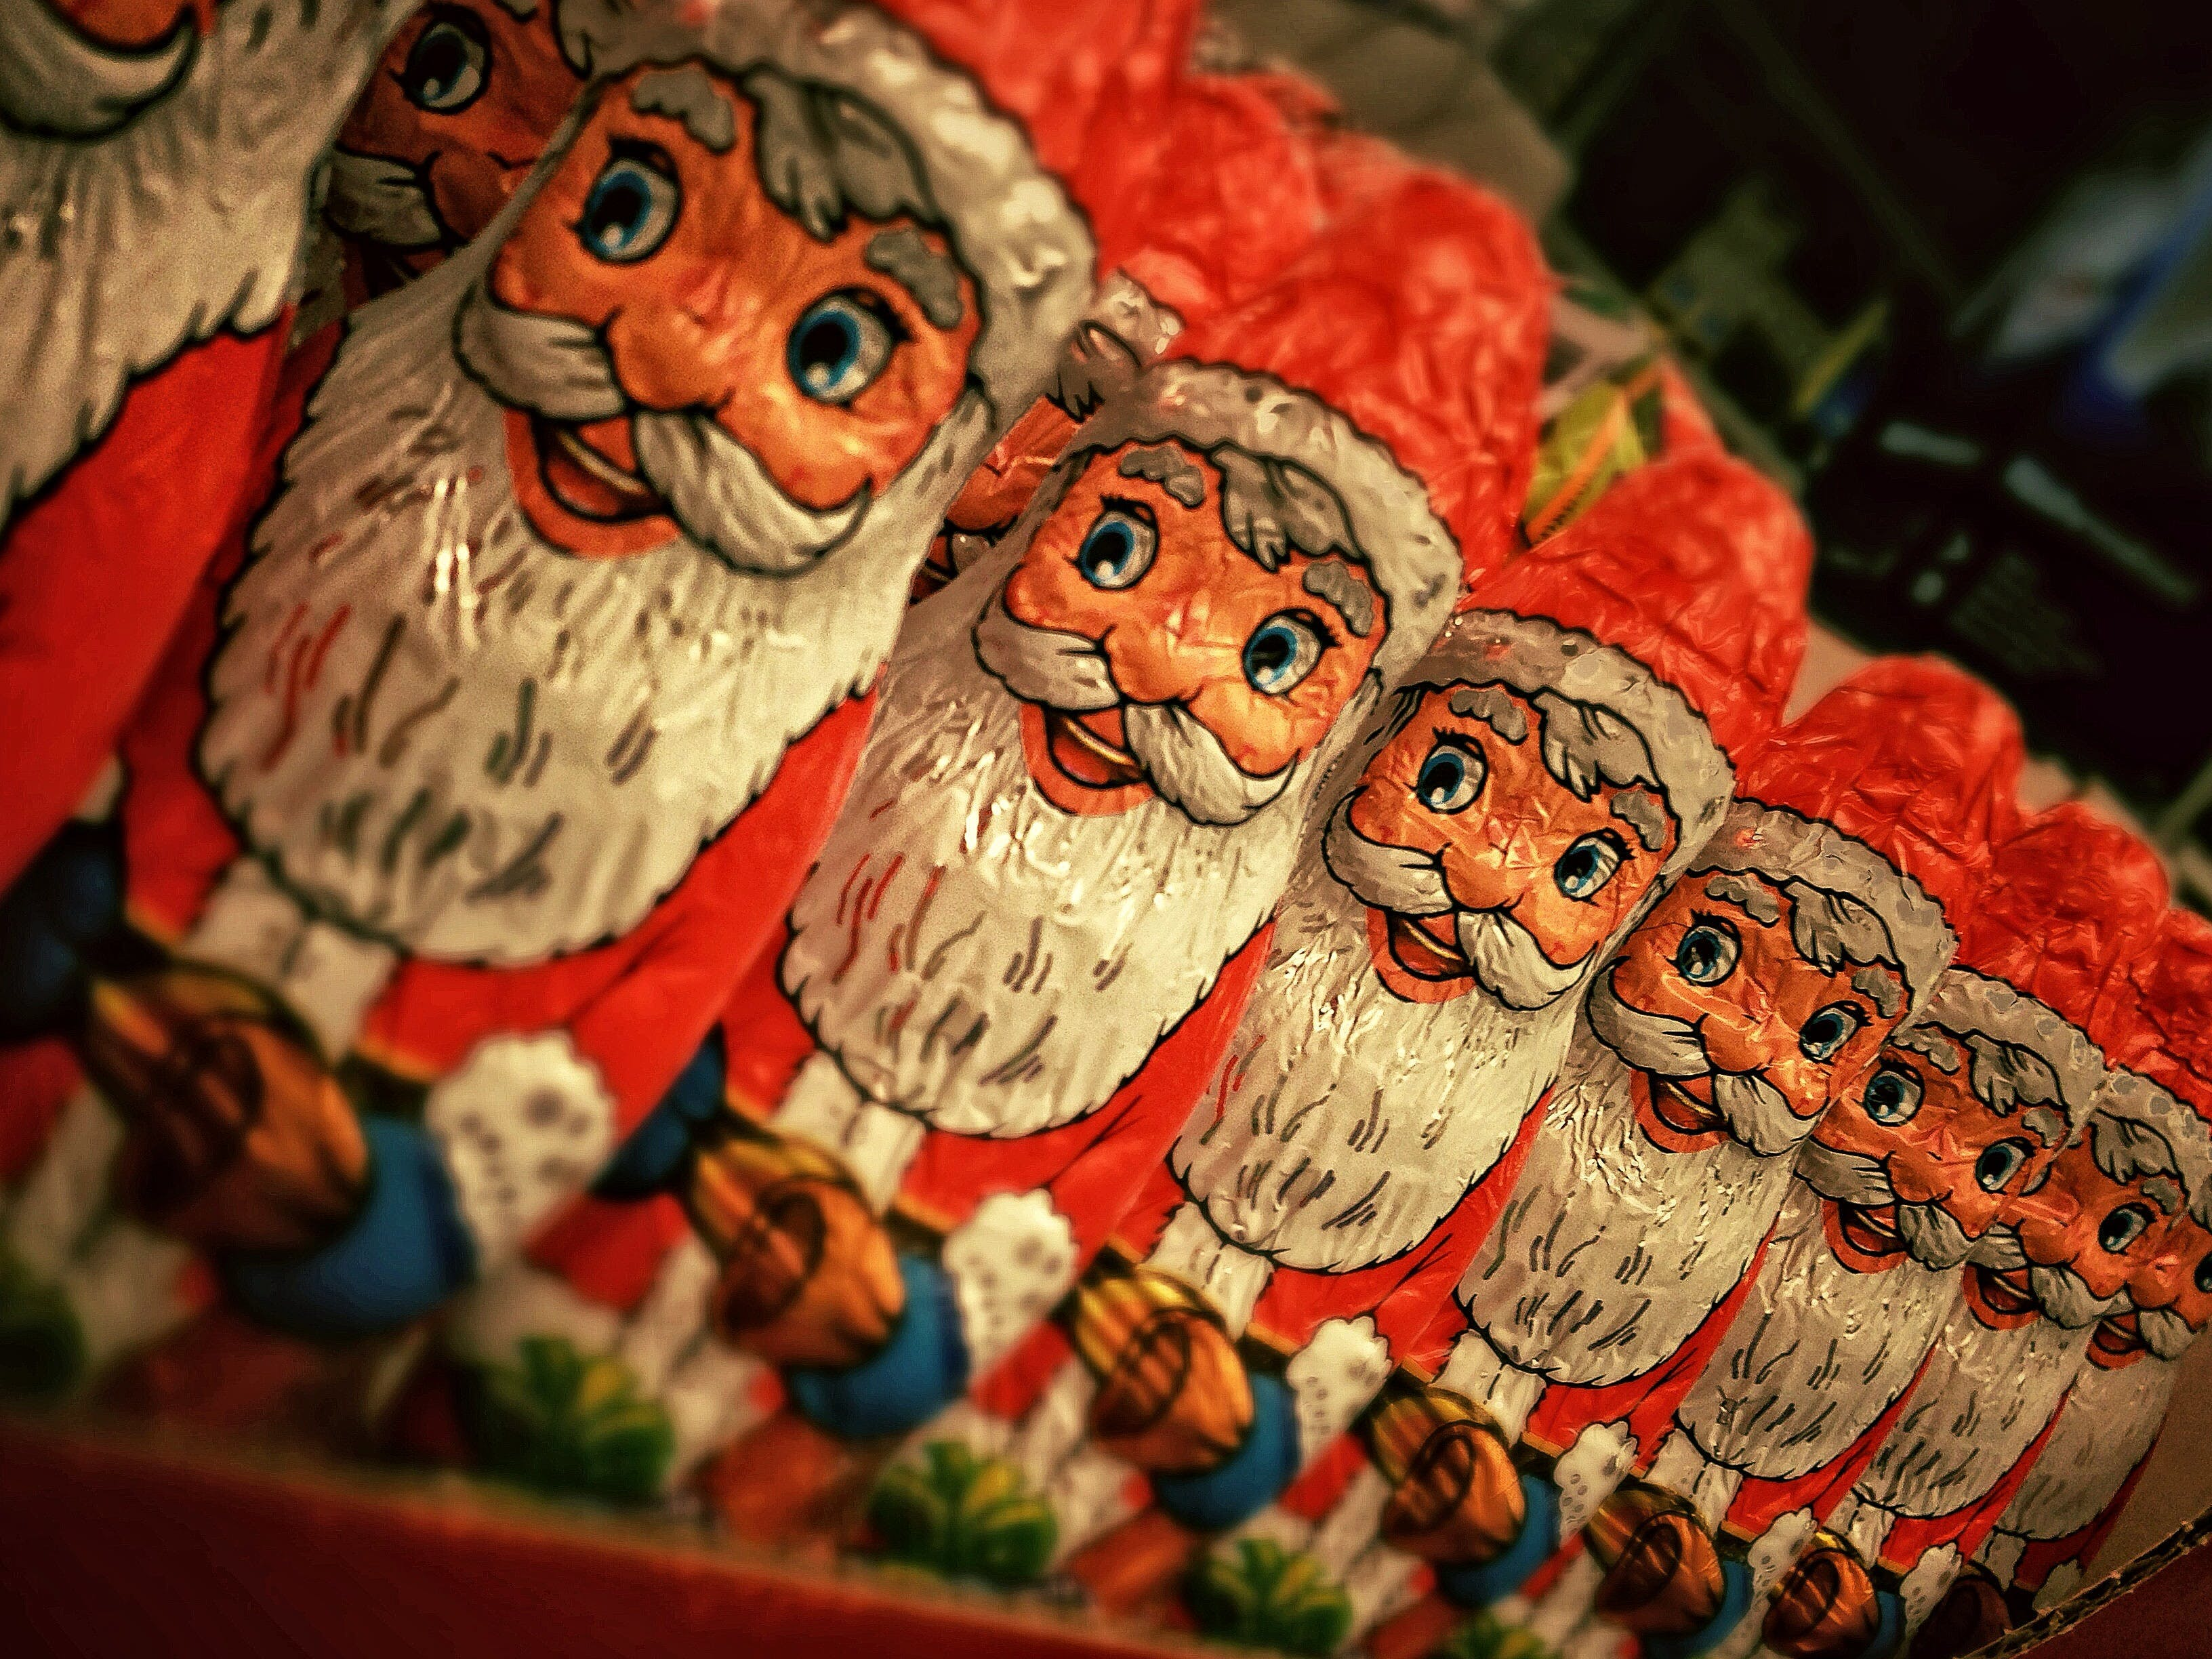 Santa Claus Chocolate Figurine